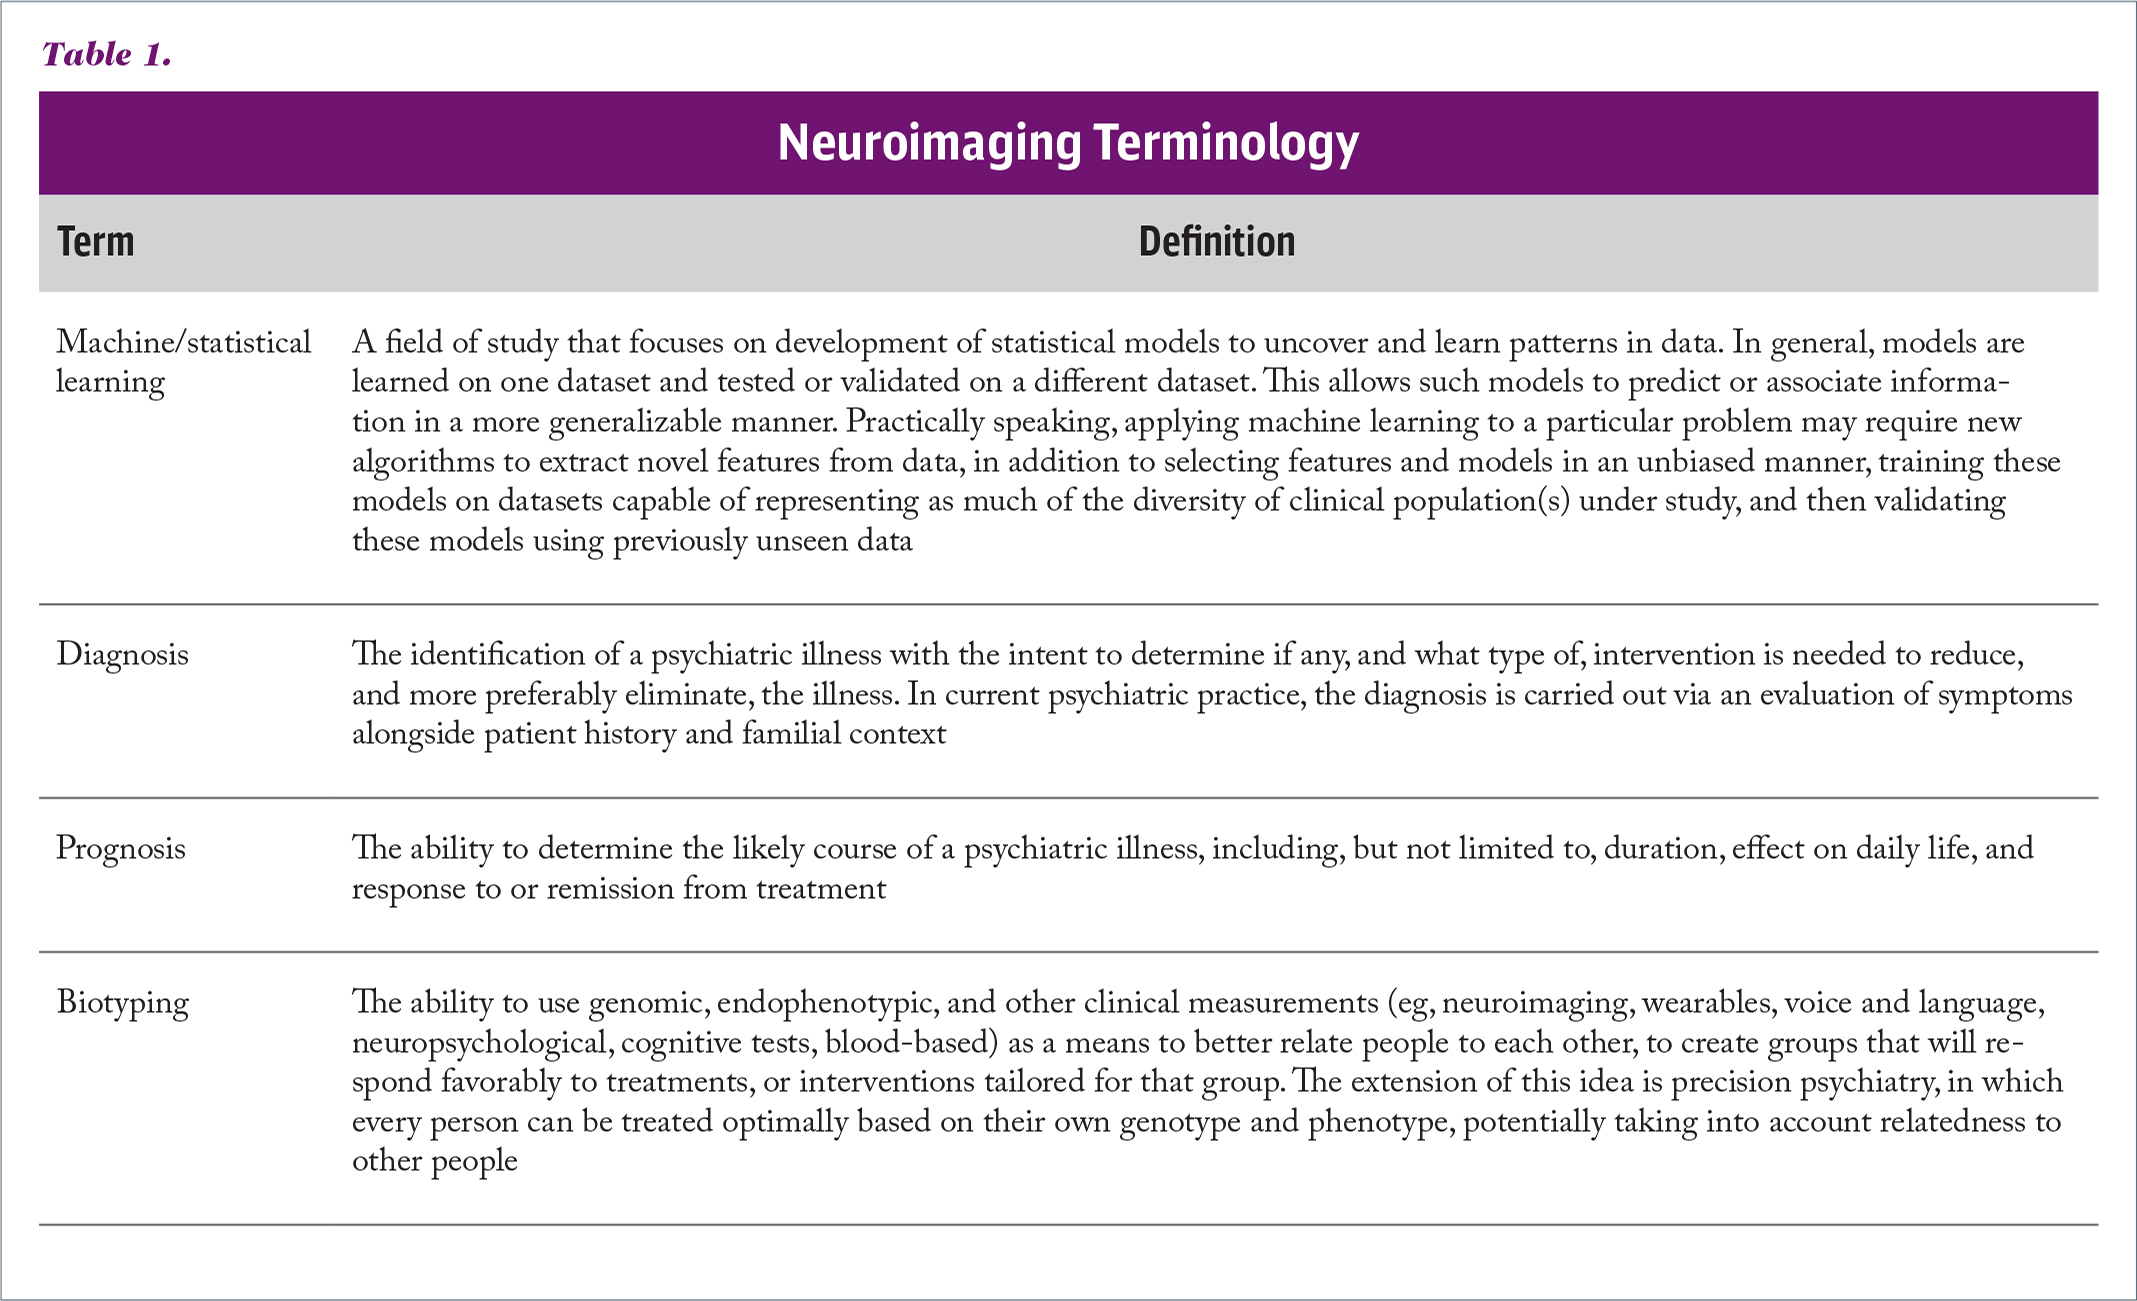 Neuroimaging Terminology